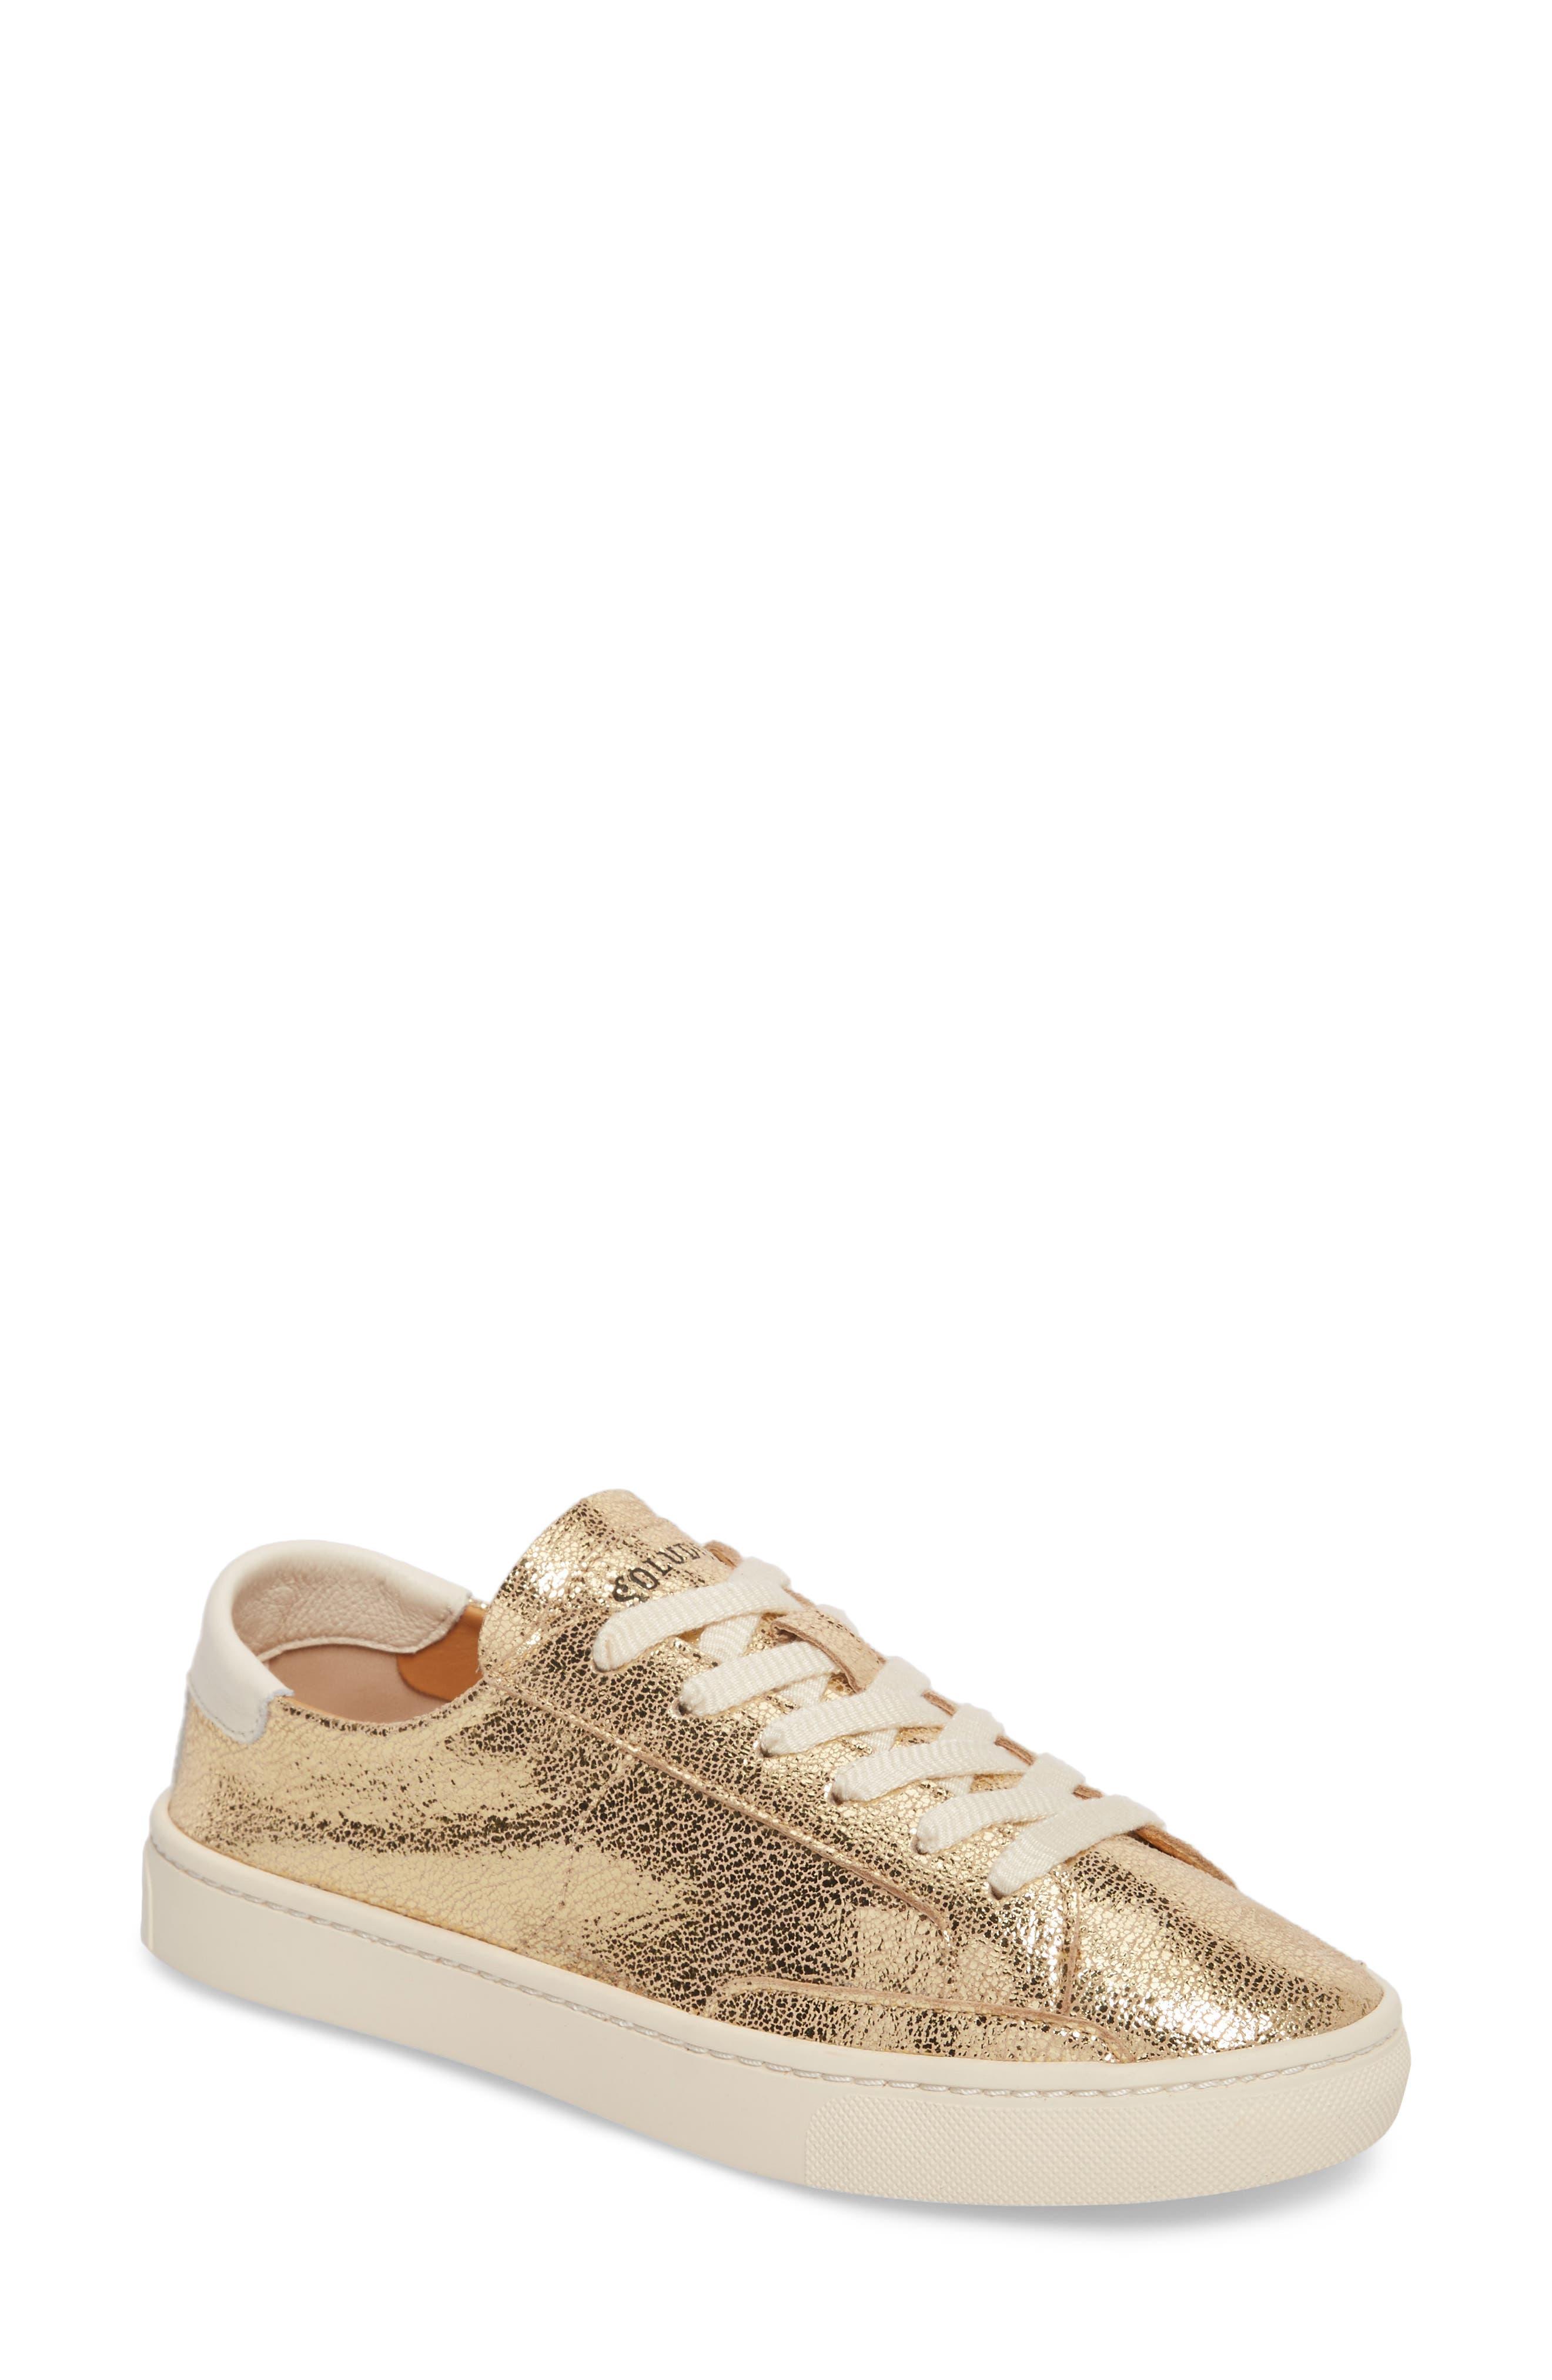 Alternate Image 1 Selected - Soludos Ibiza Metallic Lace-Up Sneaker (Women)